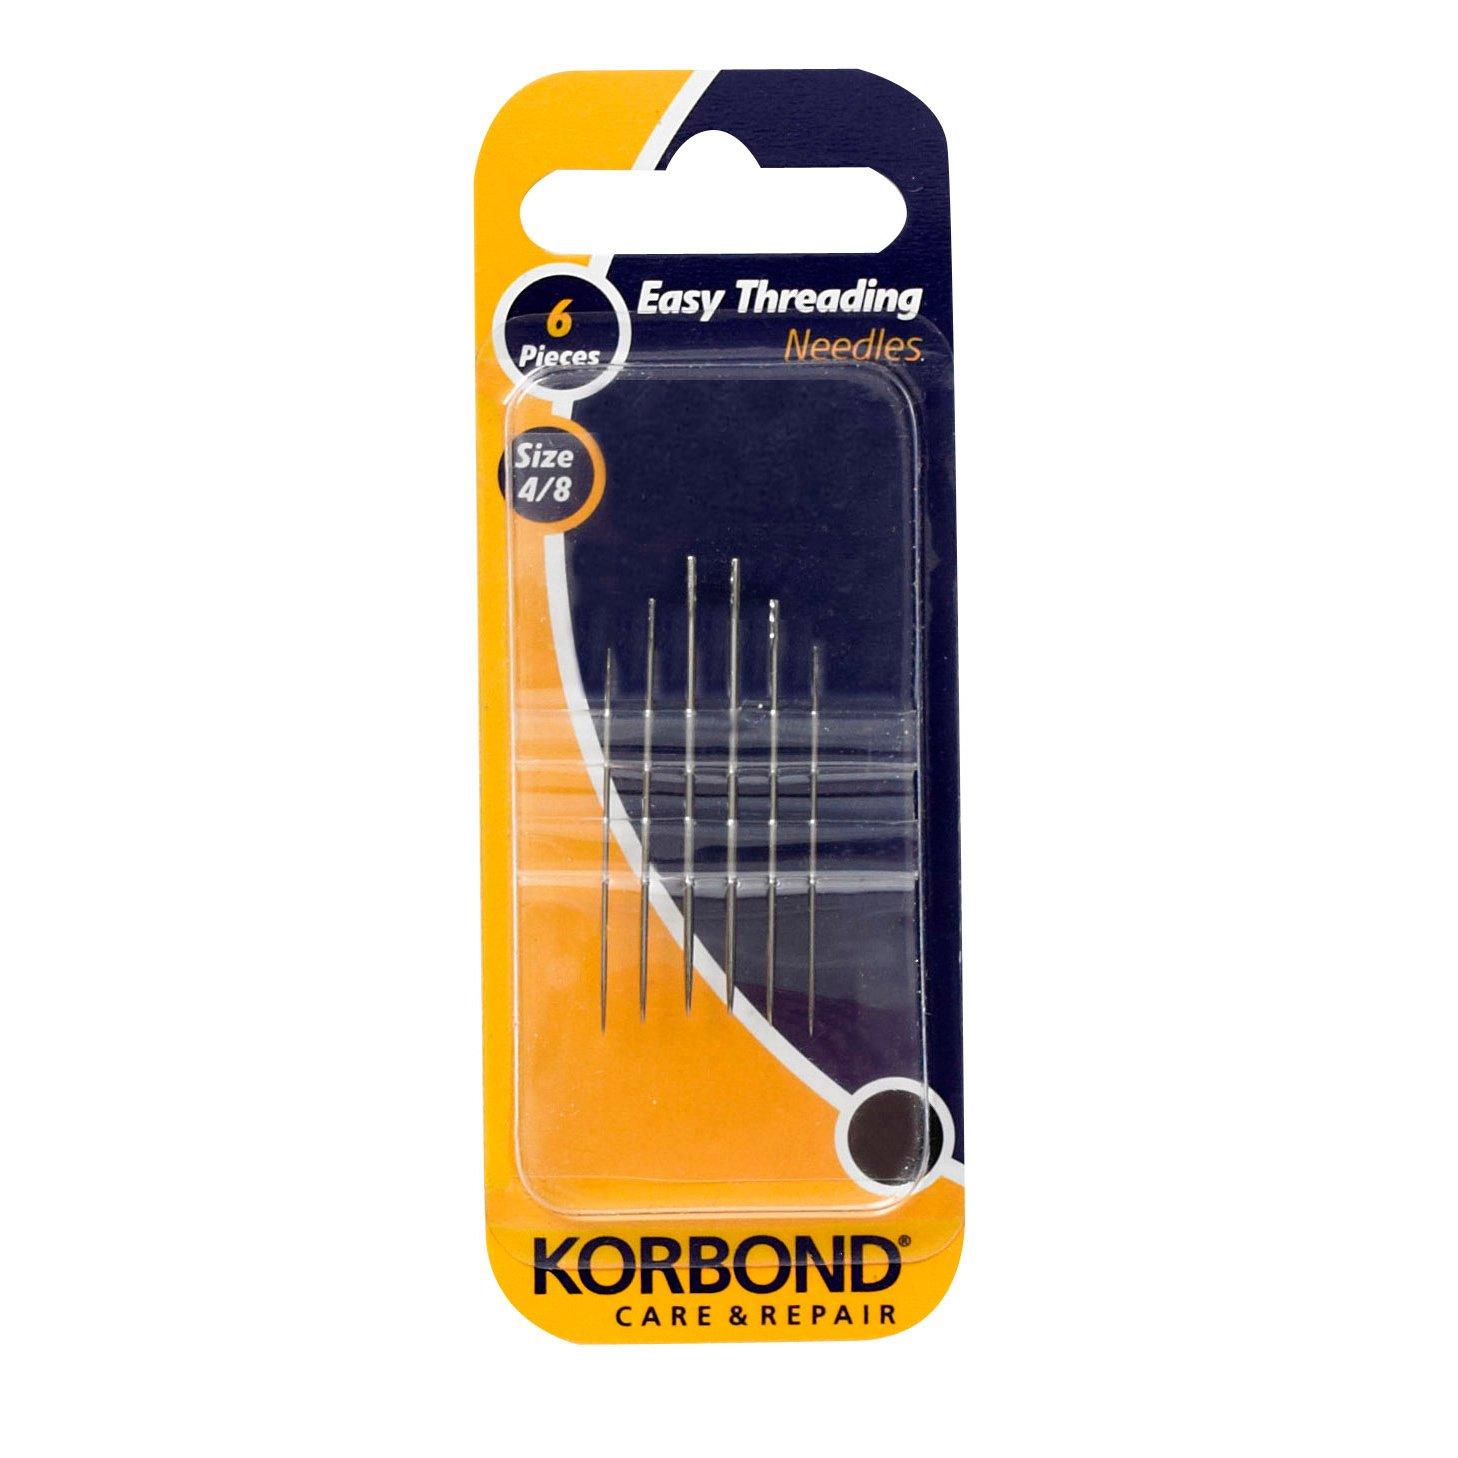 EASY THREADING NEEDLES Korbond 110260